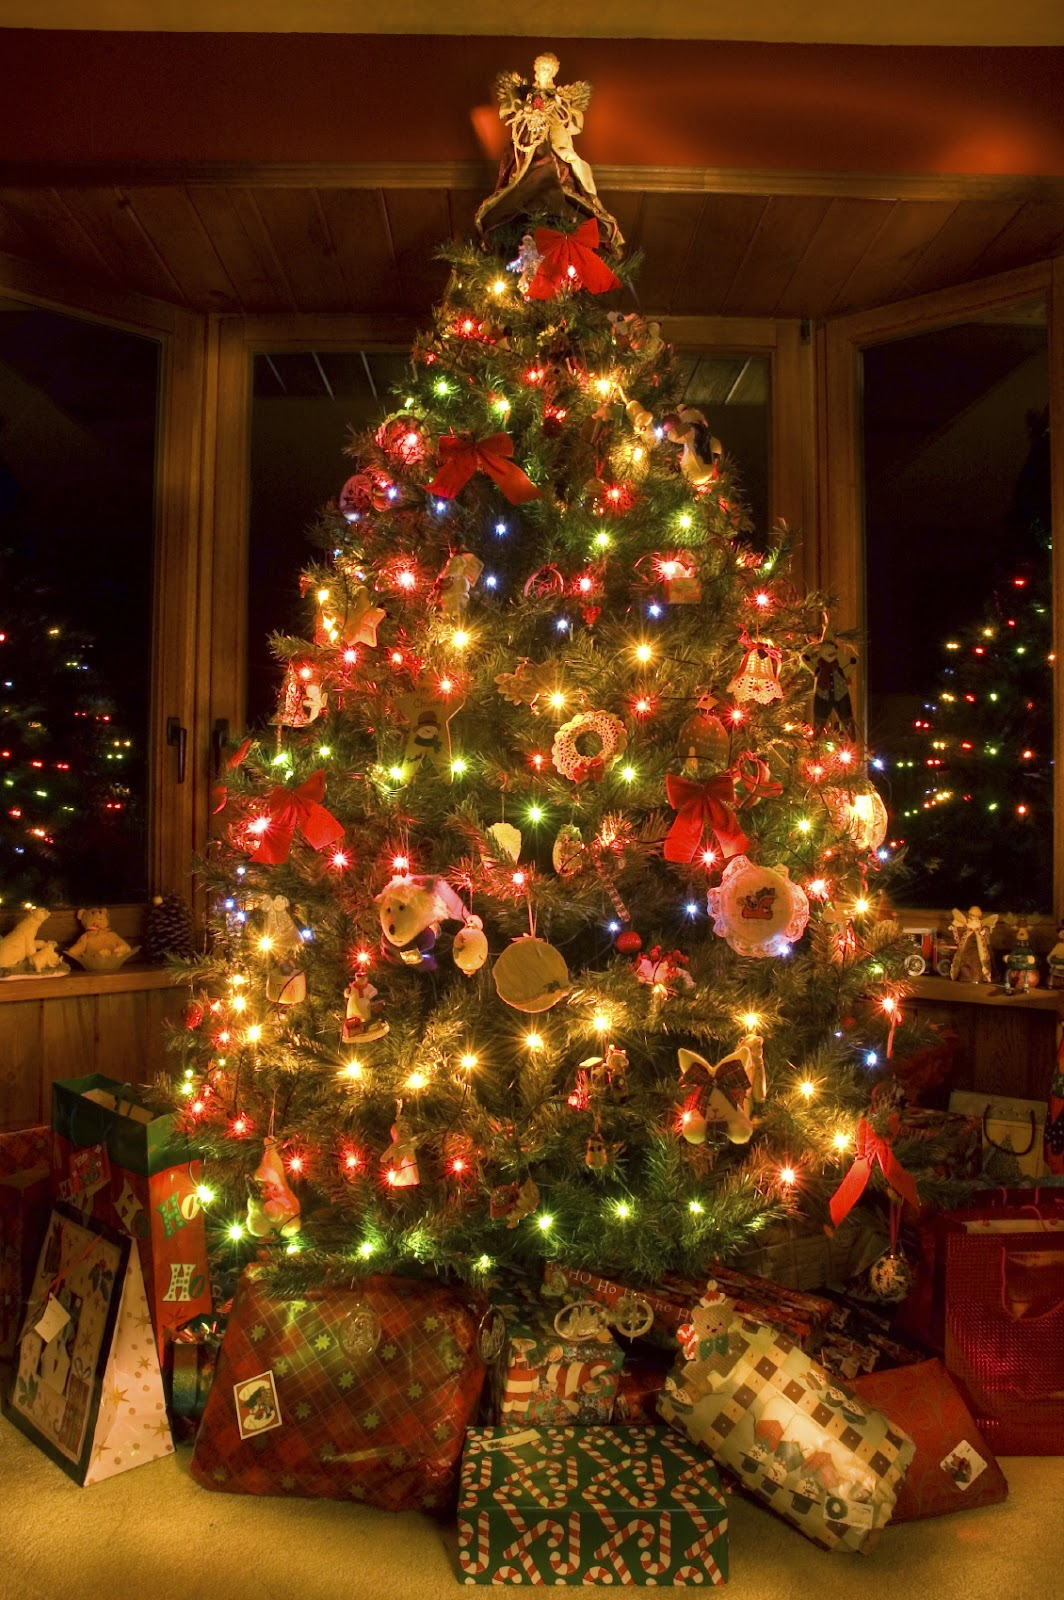 Batman christmas tree ornaments - Batman Christmas Tree Ornaments 36